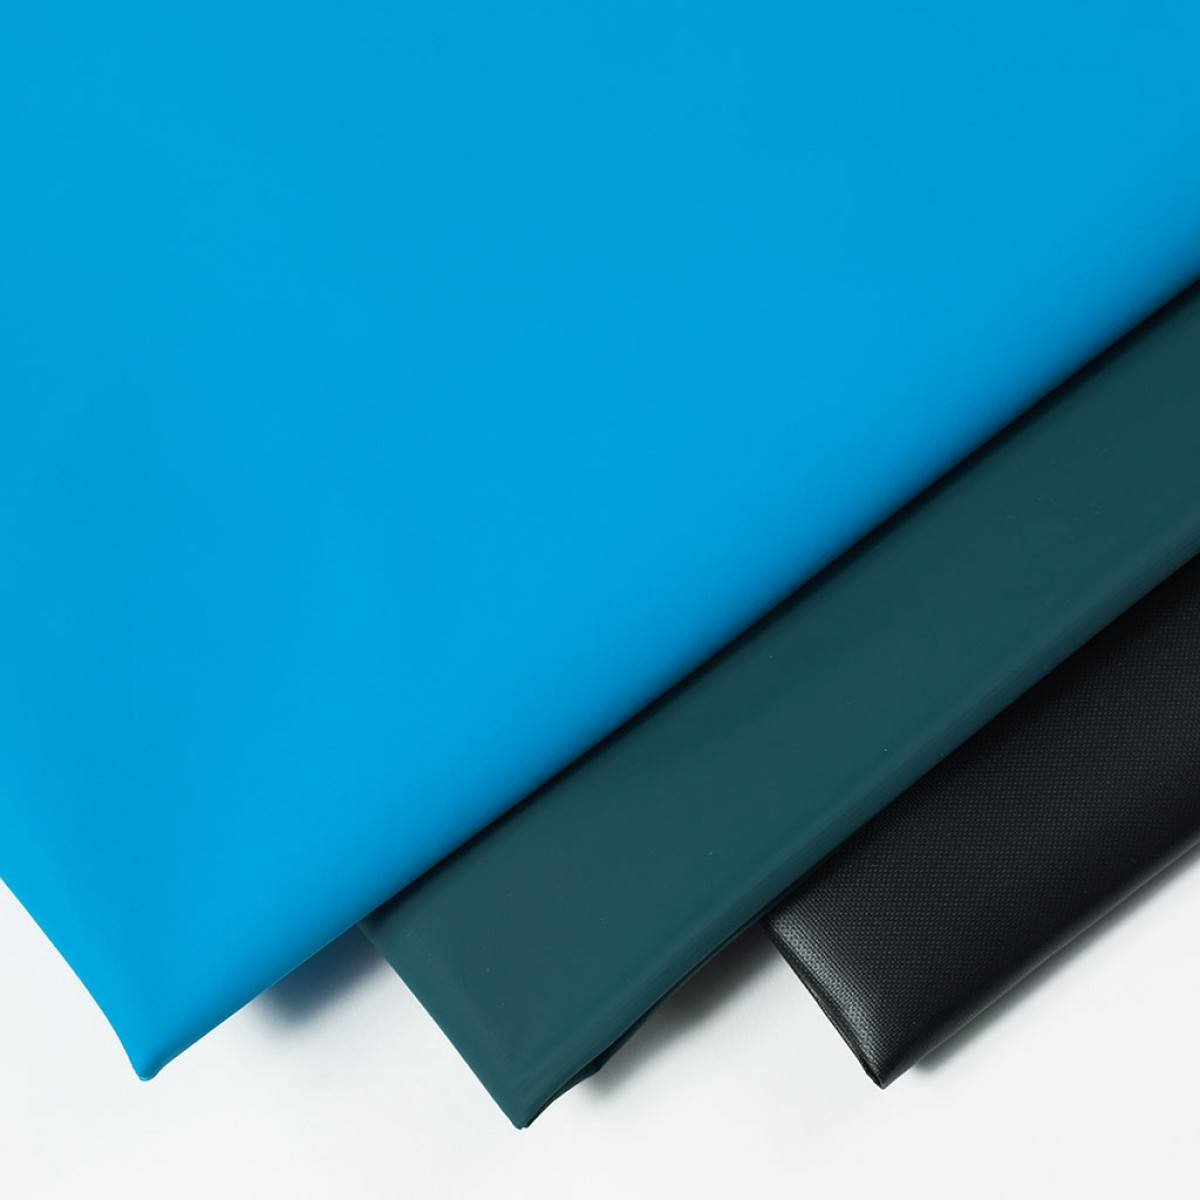 VINYL / PVC Coated Fabric for Medical Mattress, Aprons & Adult Bibs